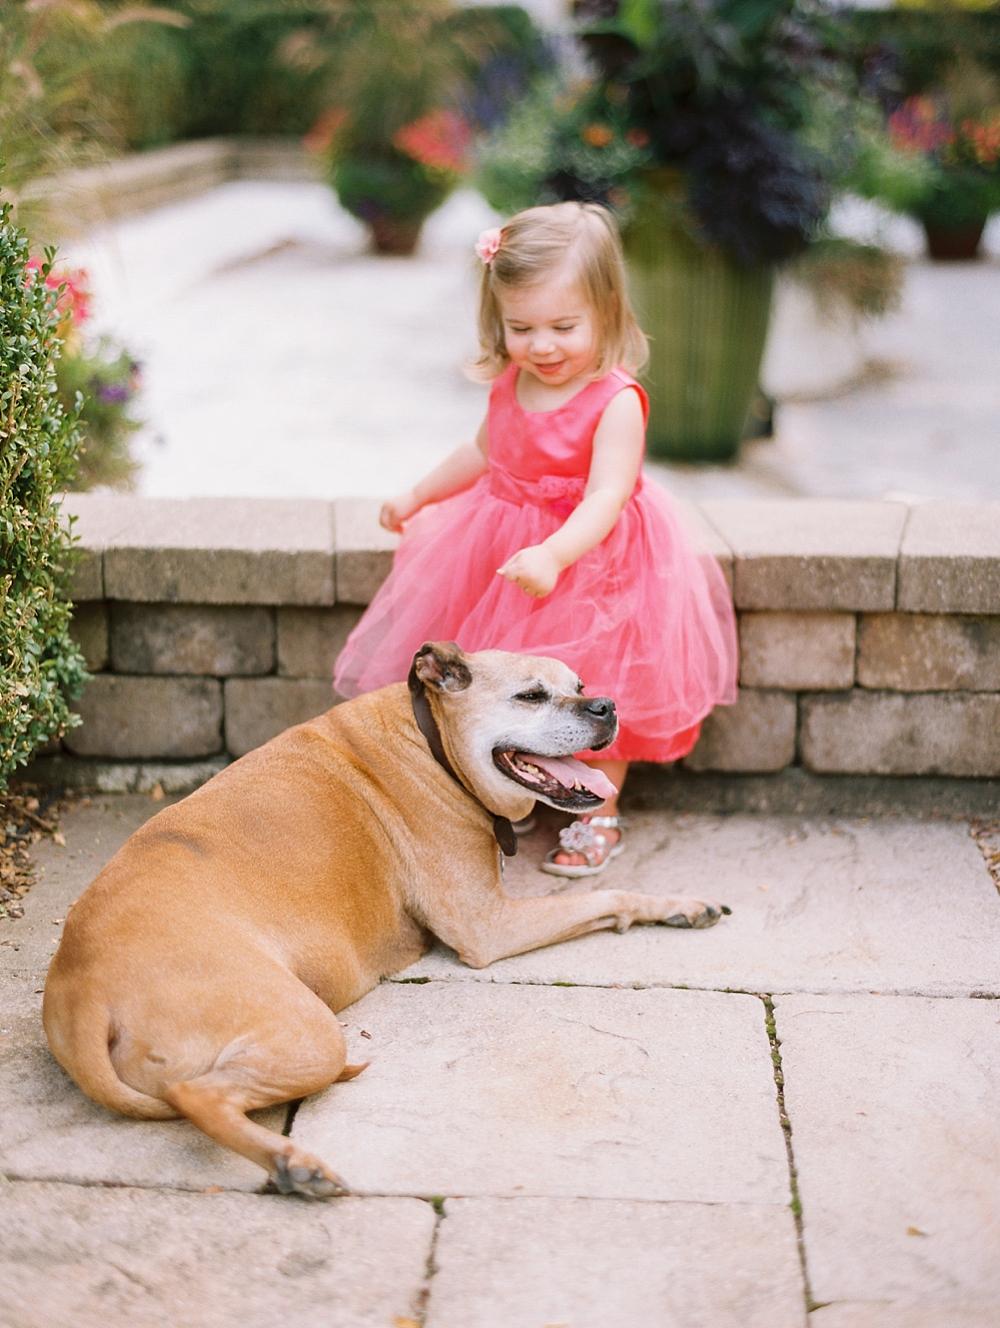 kristin-la-voie-photography-lifestyle-chicago-dog-5